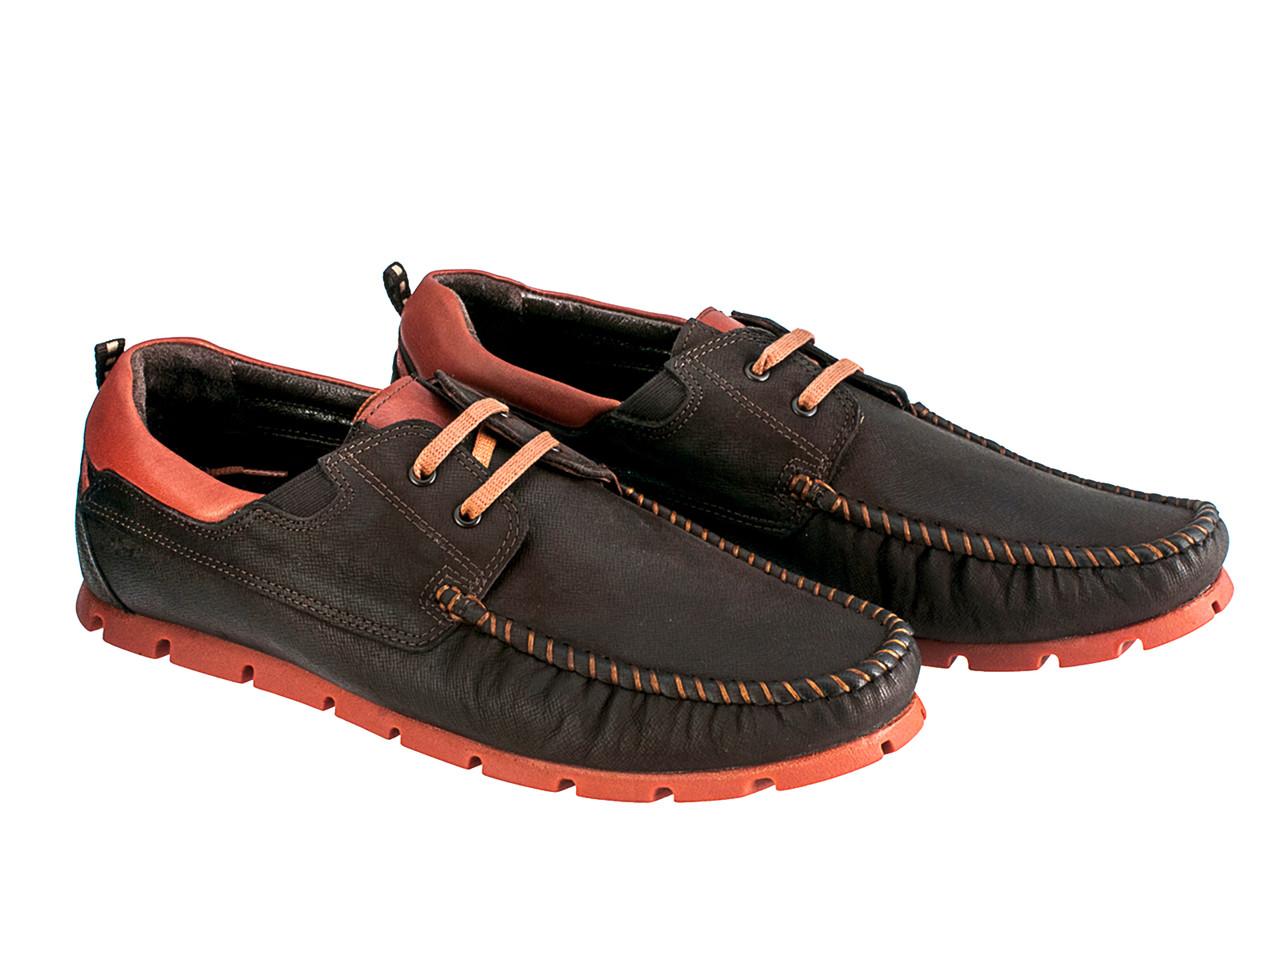 Мокасины Etor 13651-16654-275 45 коричневые